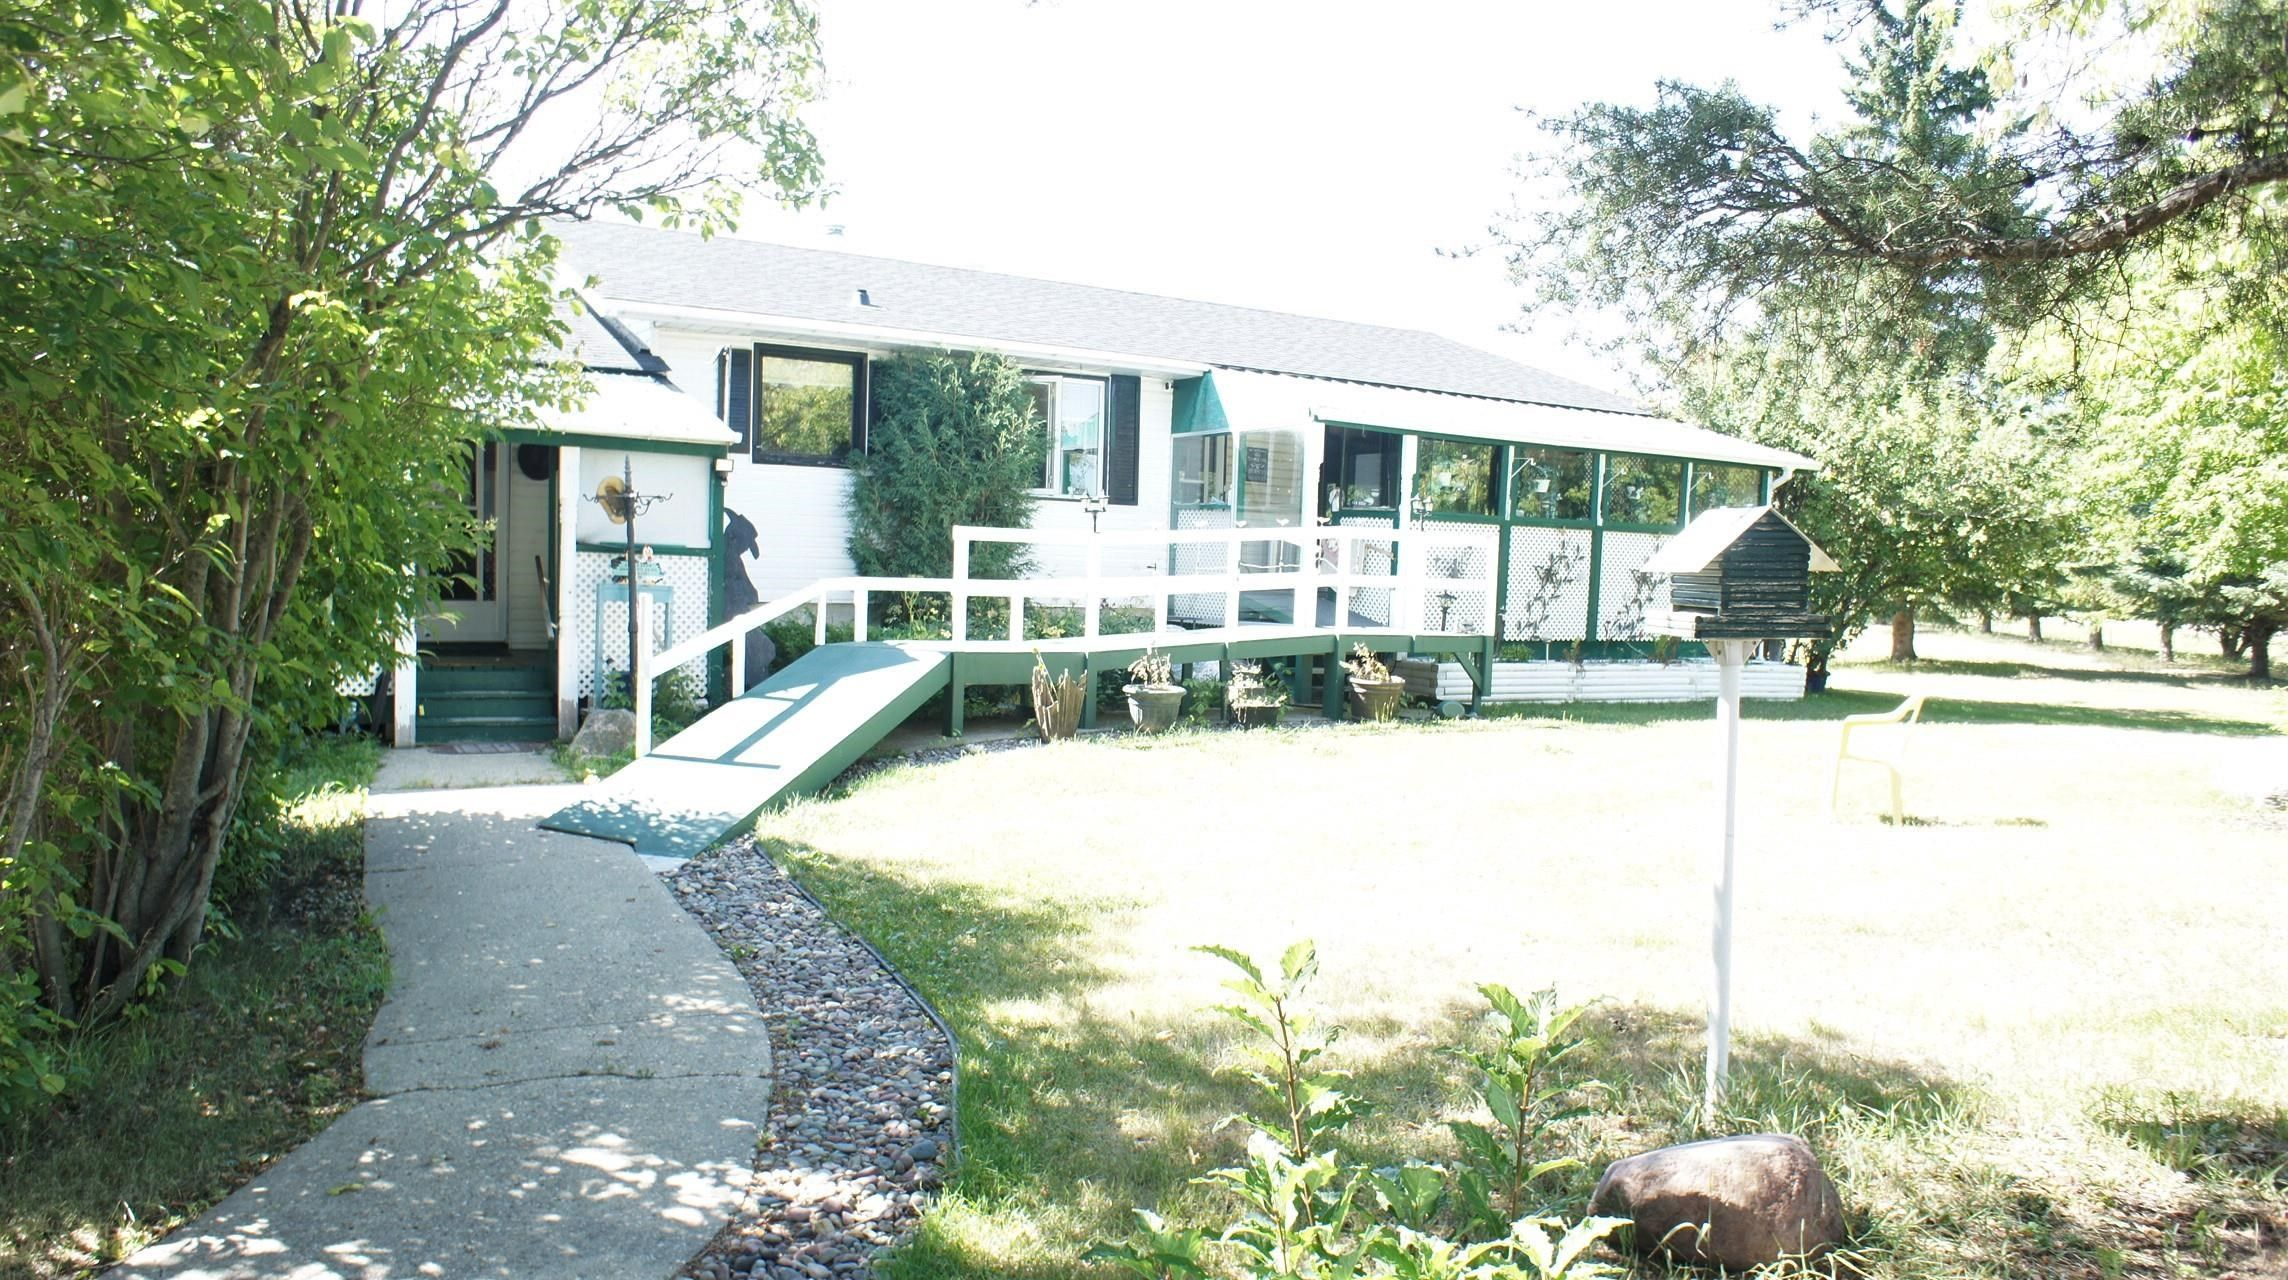 Main Photo: 30 50509 RGE RD 221: Rural Leduc County House for sale : MLS®# E4260447